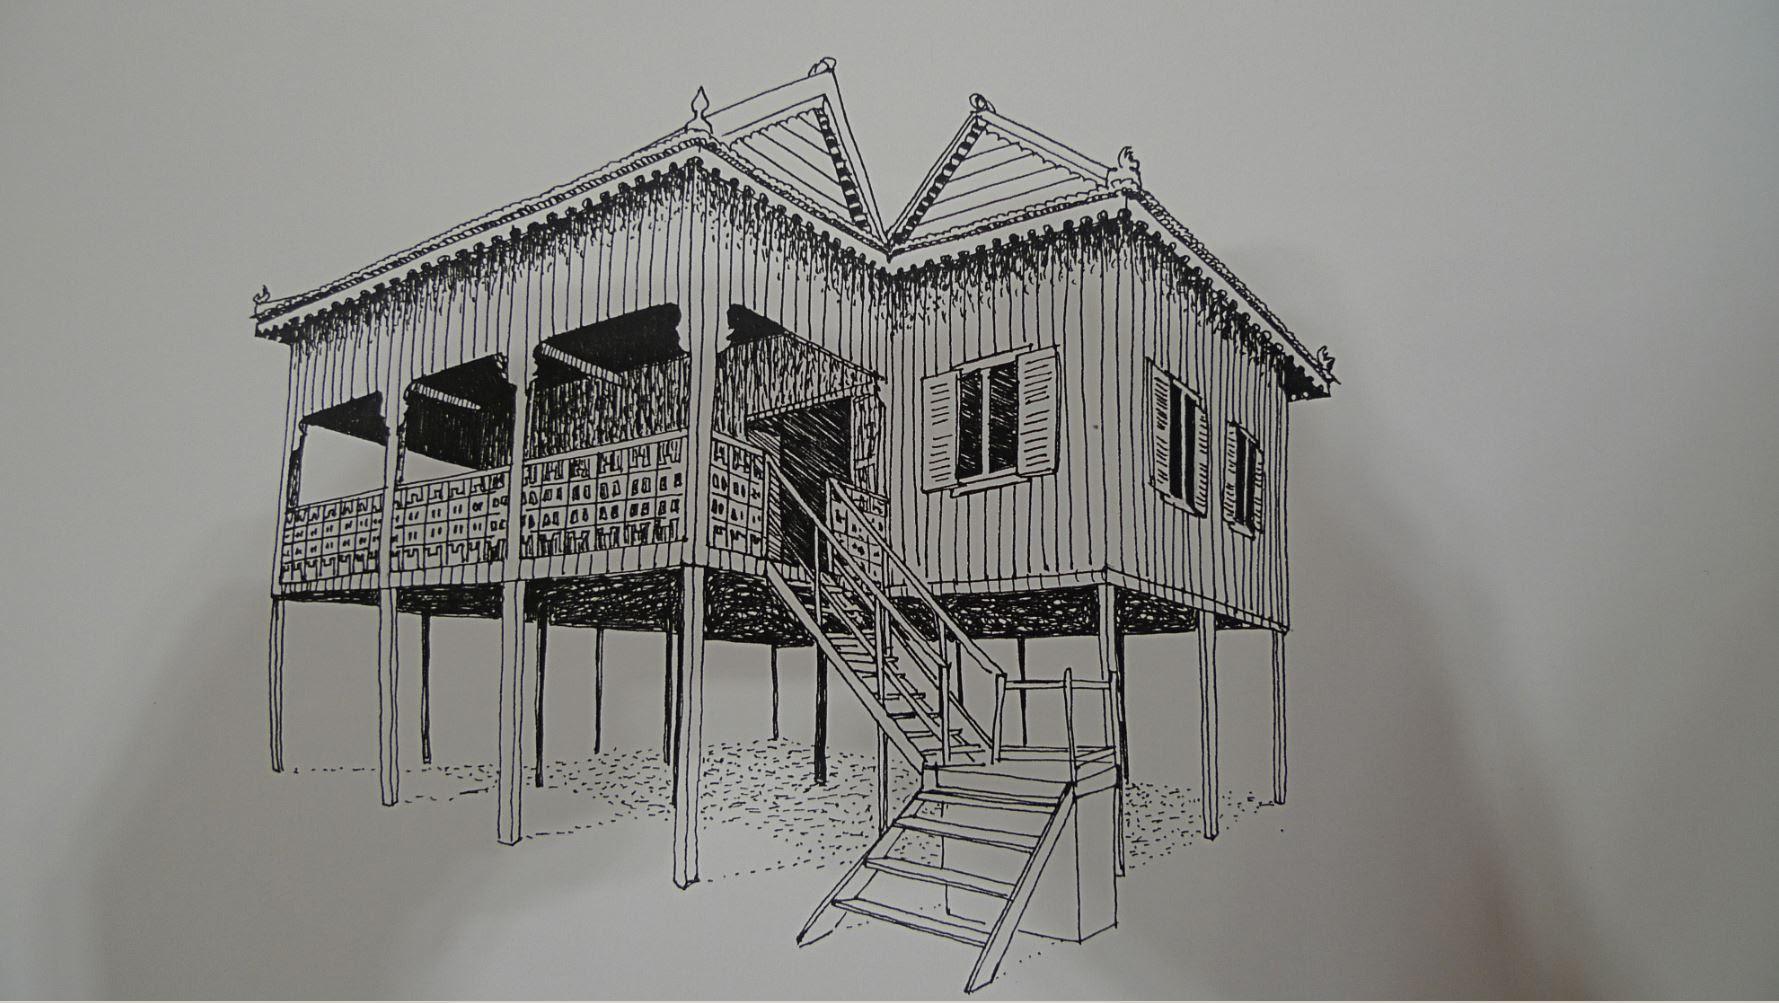 House Bram